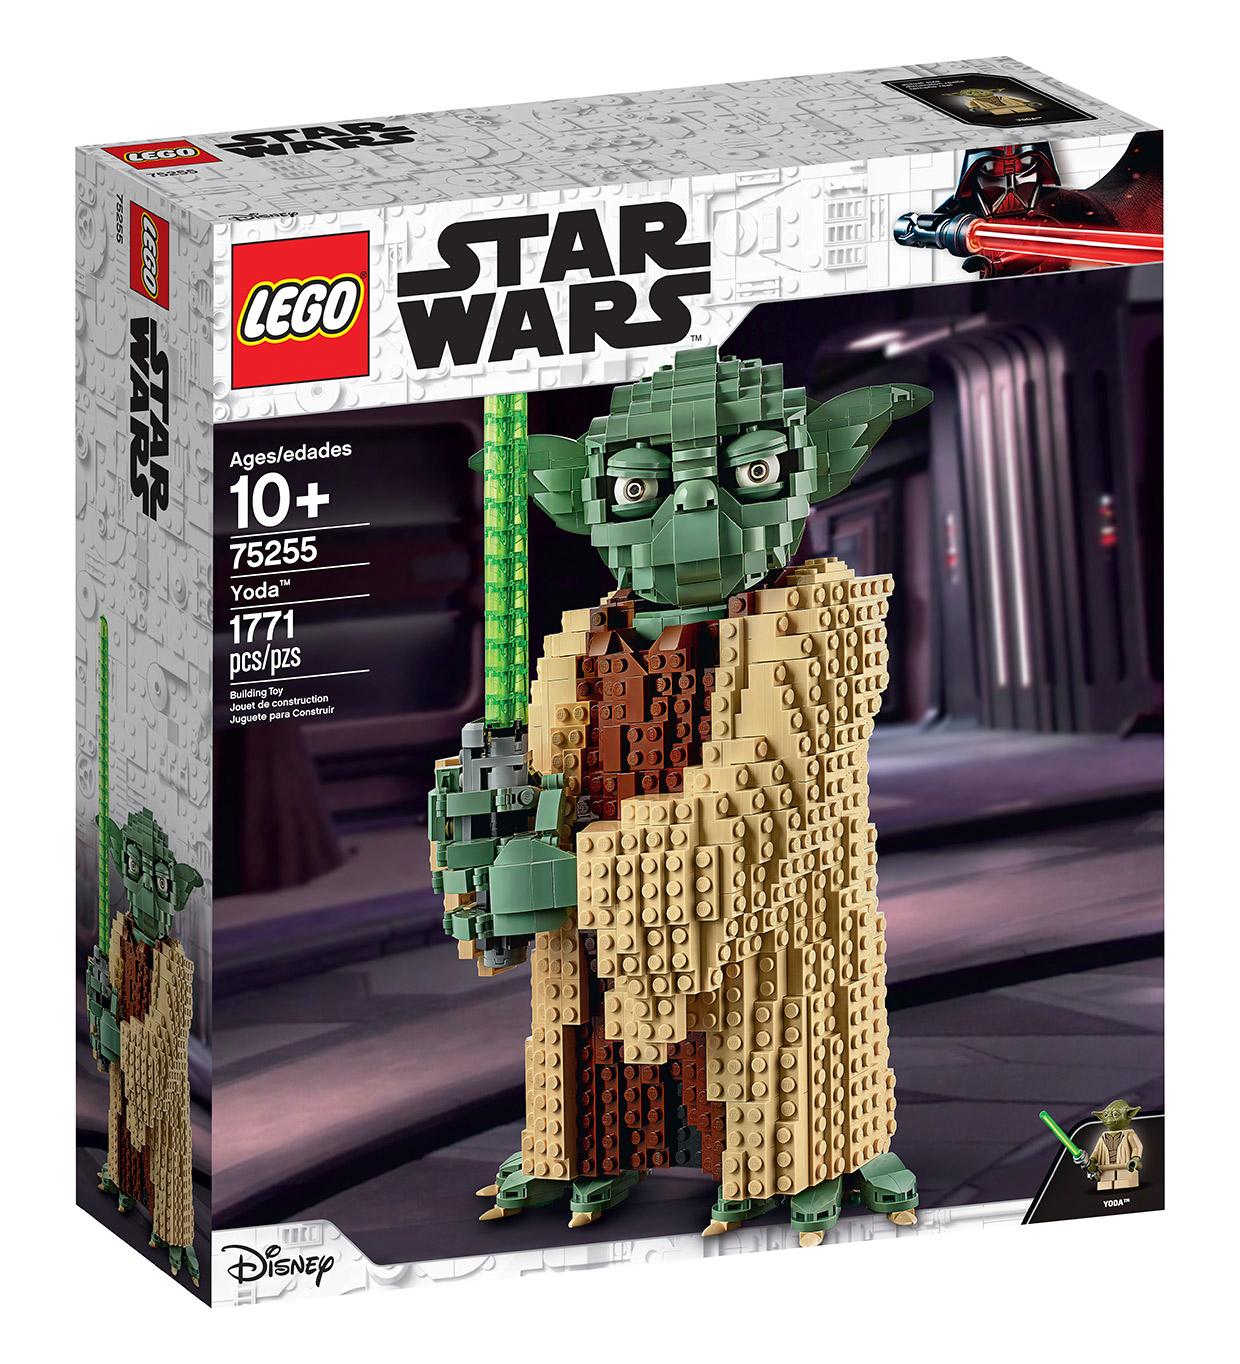 Lego Star Wars Set Lets You Build A Giant Yoda